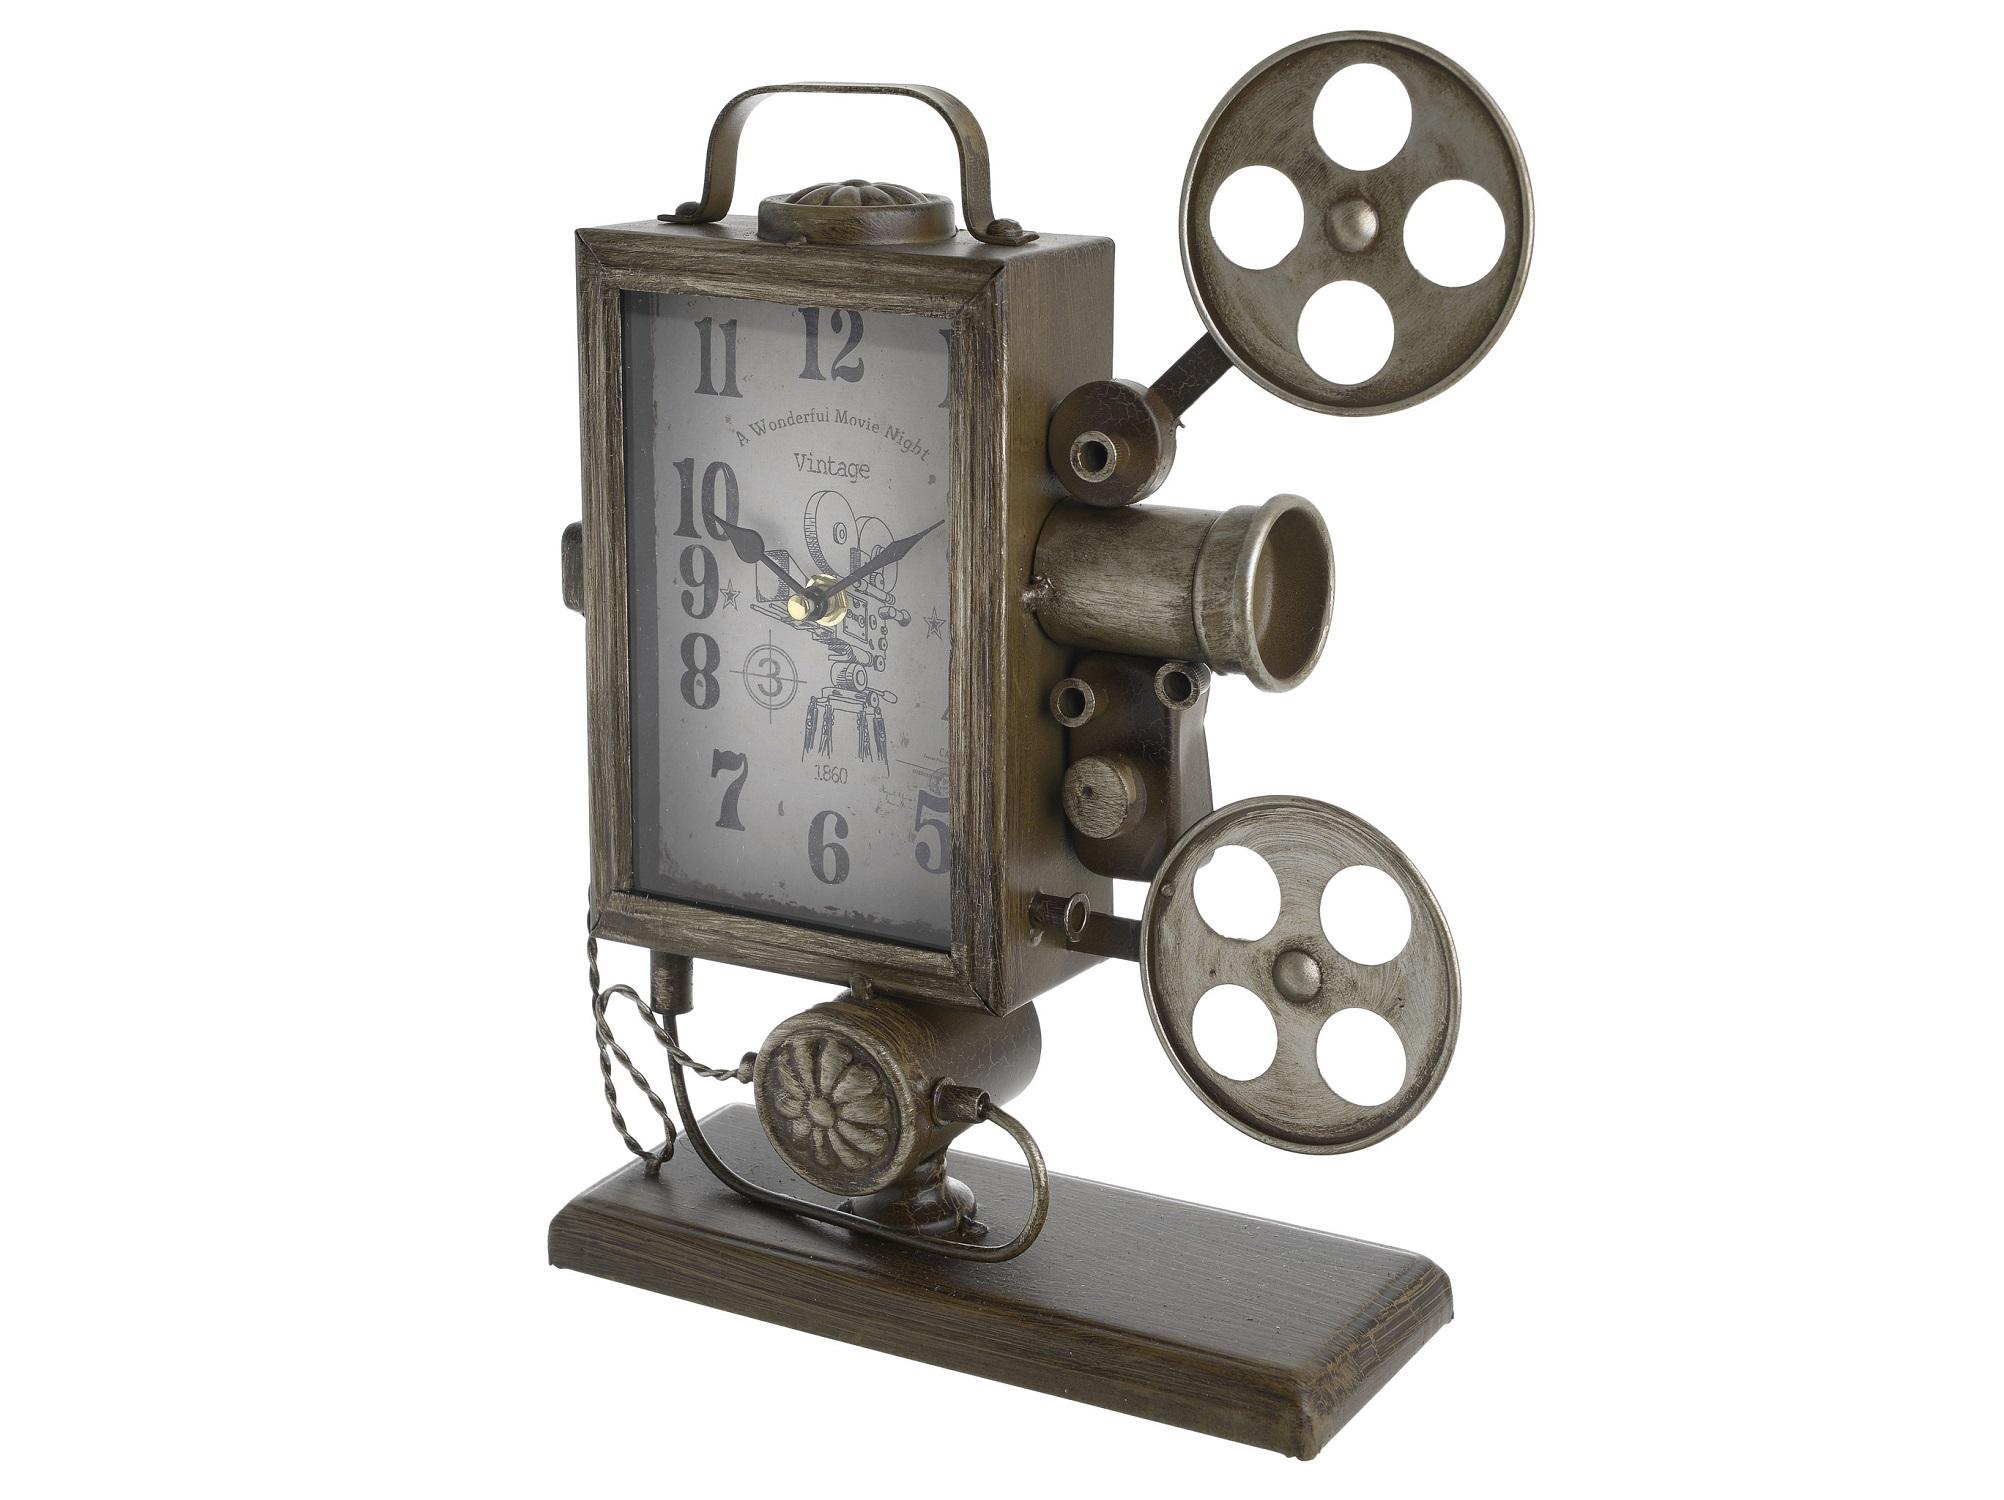 Часы настольные VitorНастольные часы<br>Кварцевый механизм<br><br>Material: Металл<br>Ширина см: 26.0<br>Высота см: 33.5<br>Глубина см: 9.0